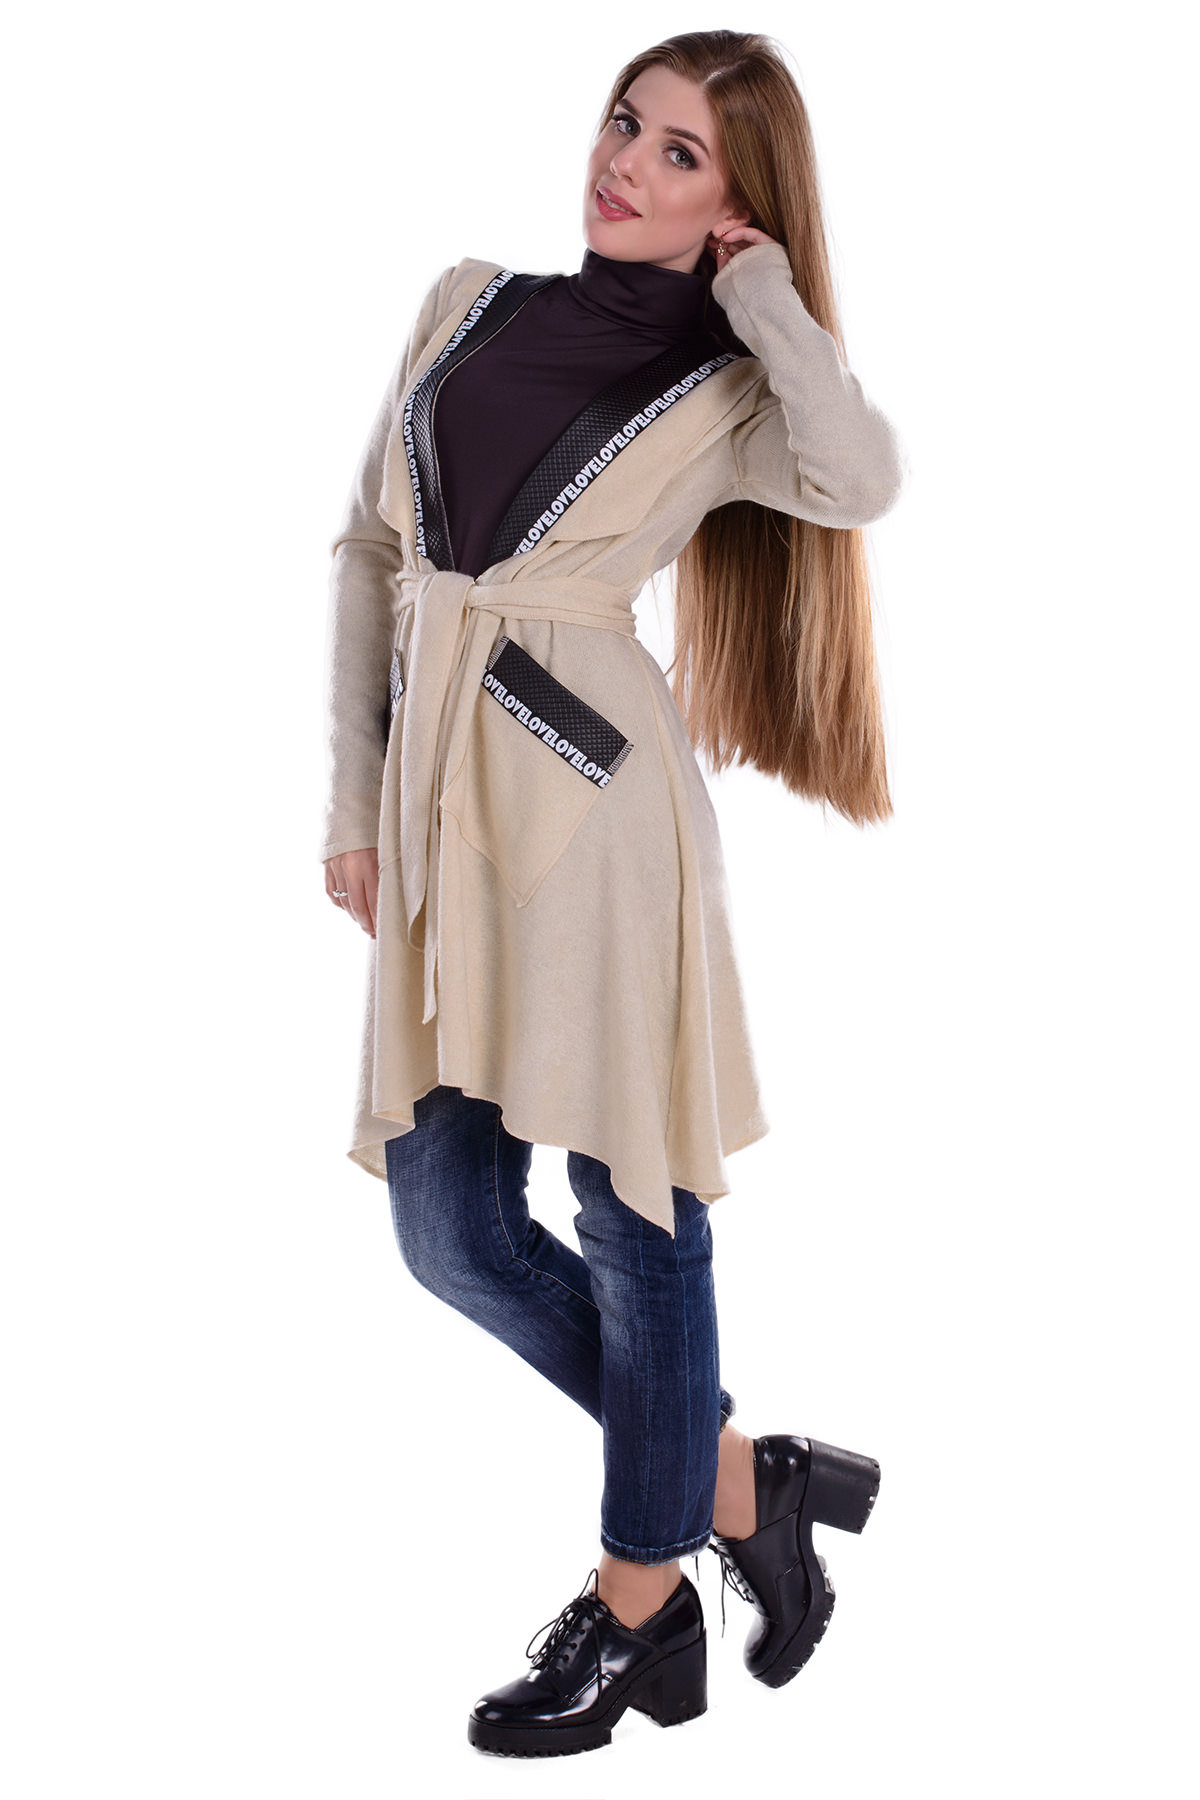 Купить женскую одежду оптом Кардиган Асти 4992